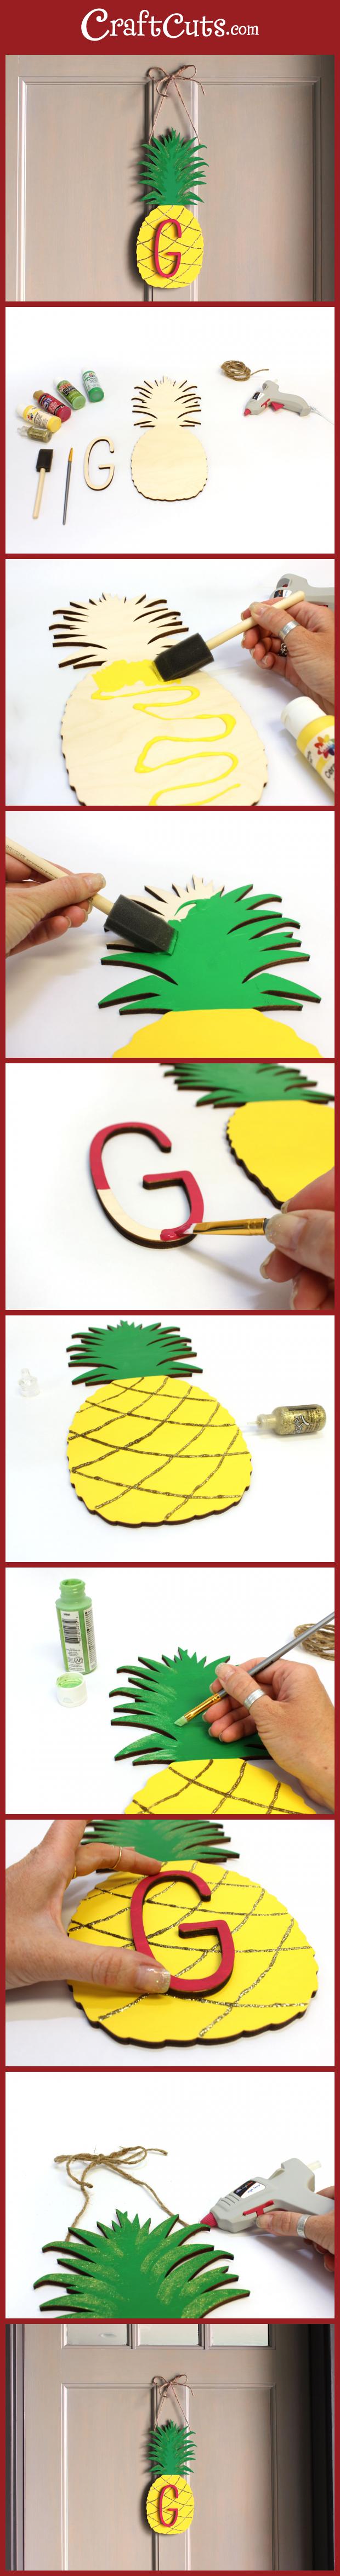 Pineapple Monogram Wreath - Craftcuts.com